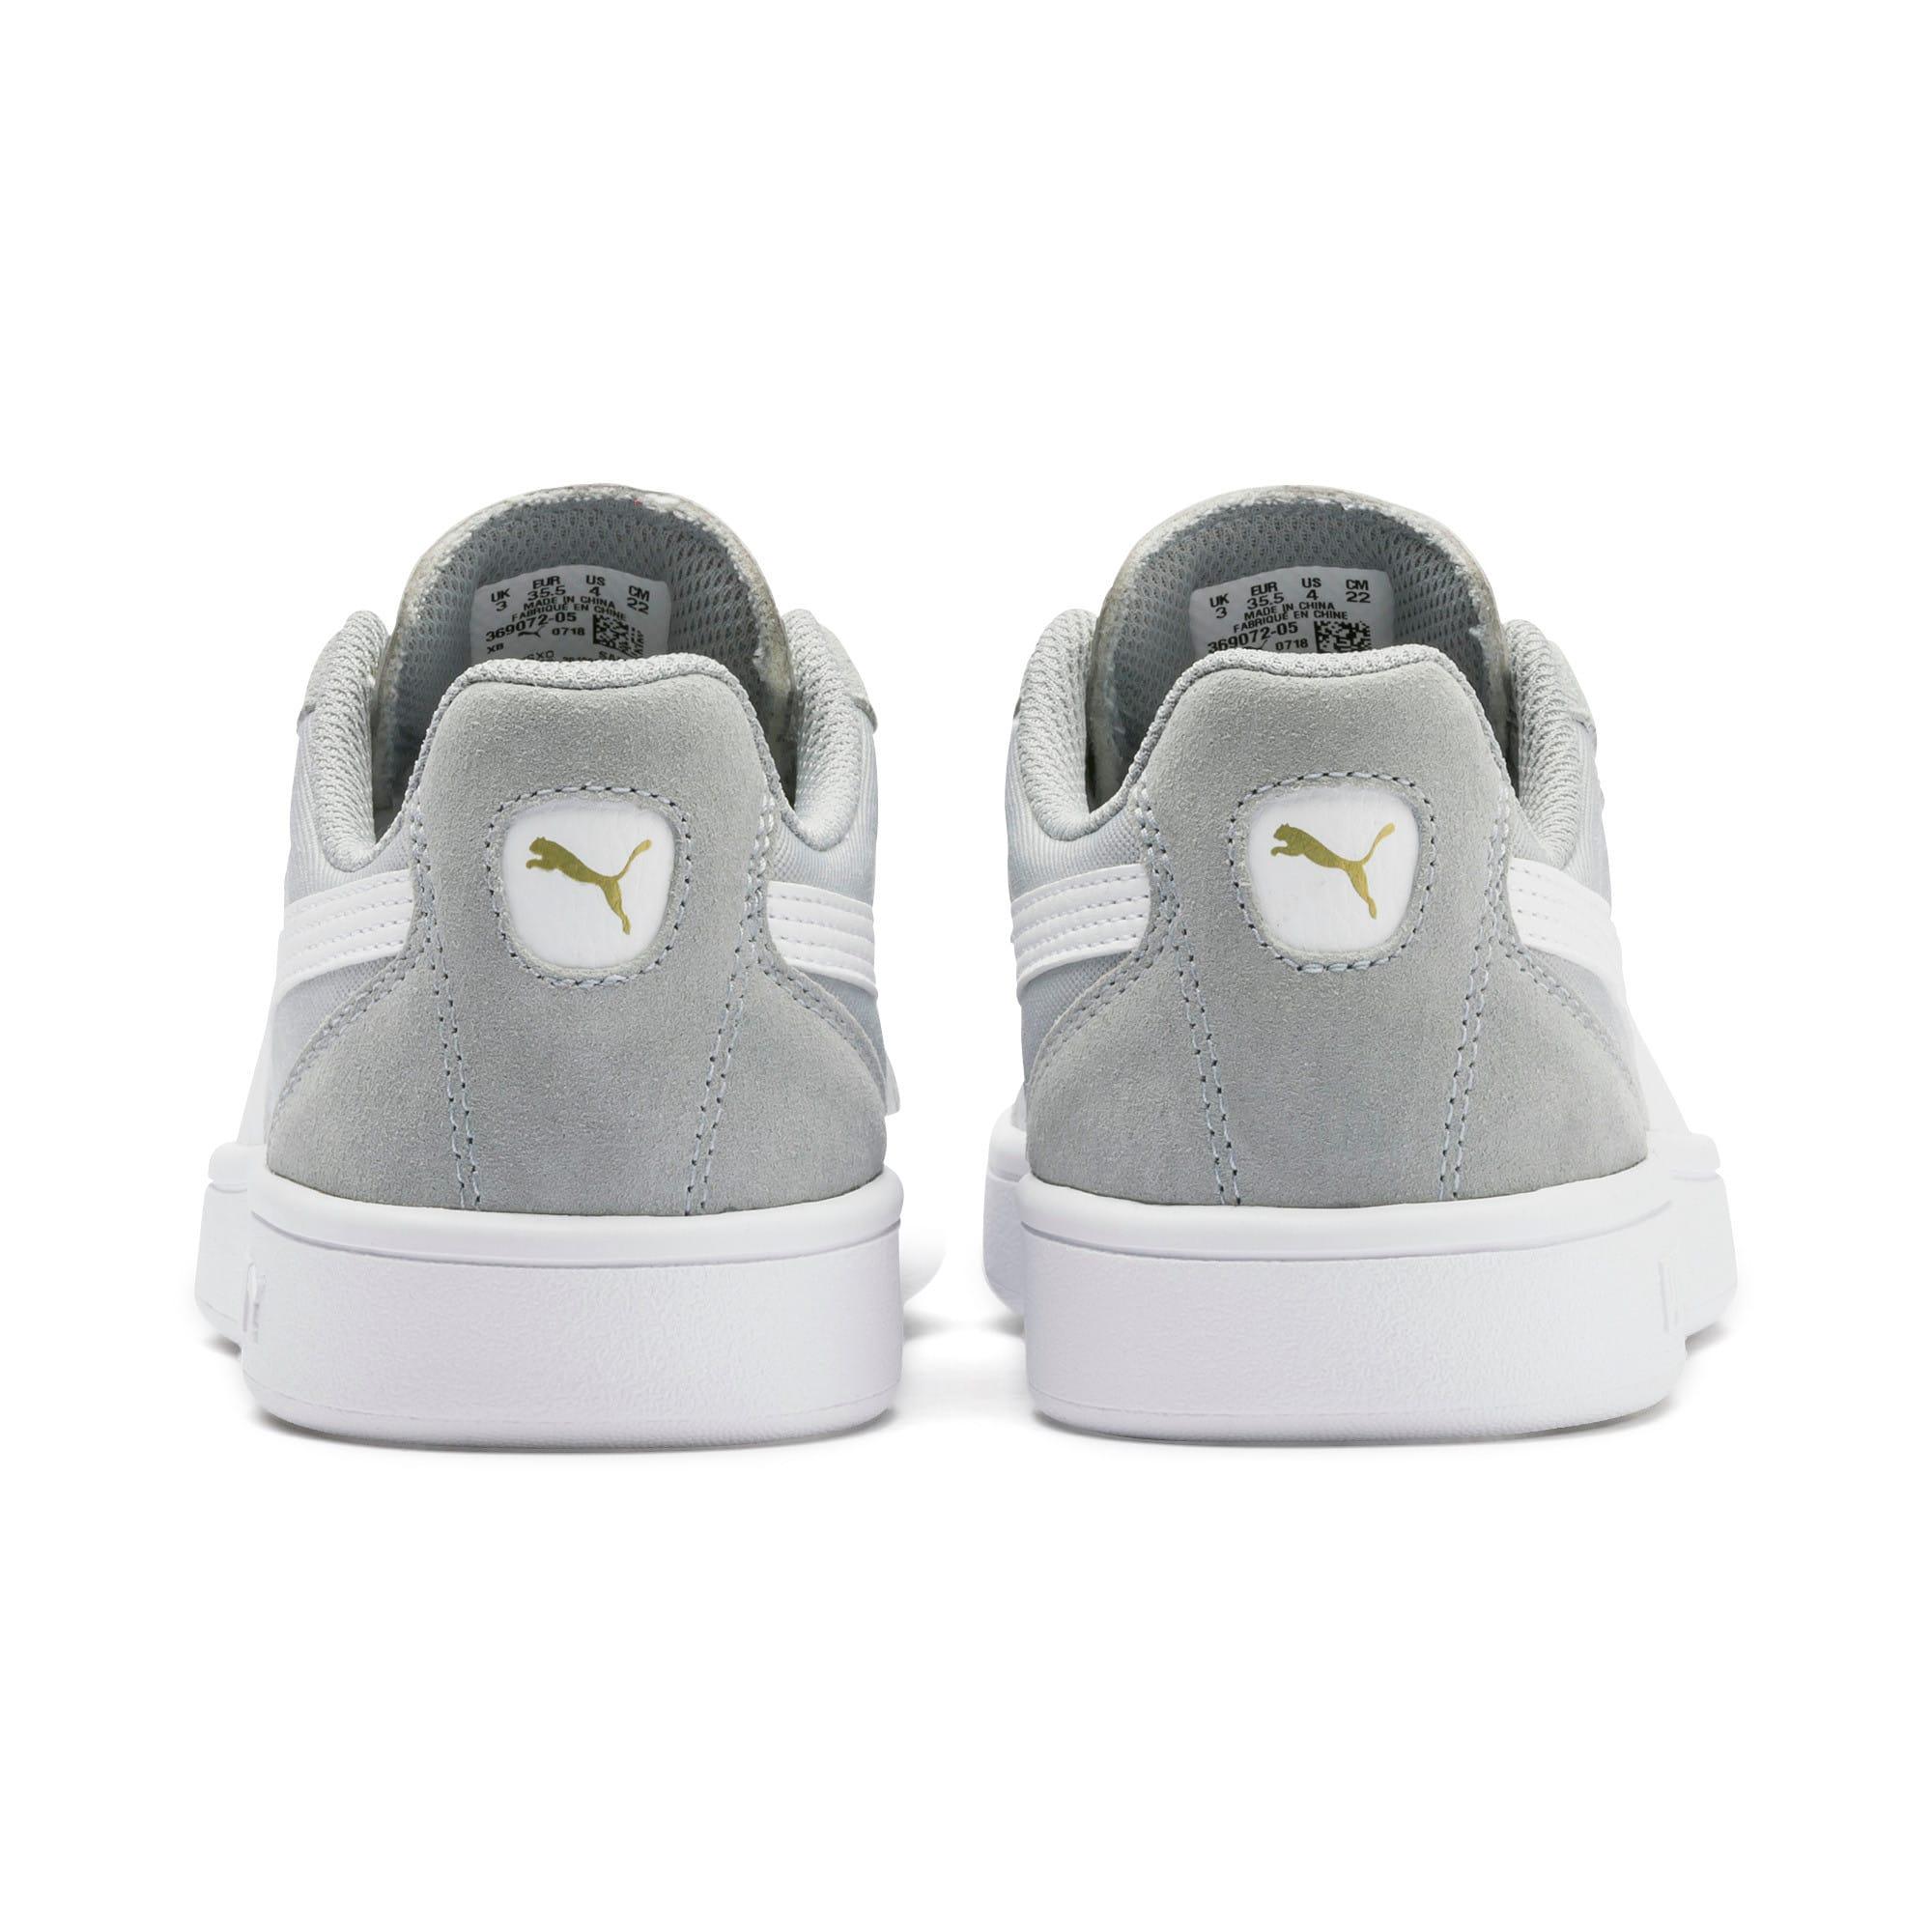 Thumbnail 3 of Astro Kick Sneakers JR, HRise-White-Gold-GViolet-Gum, medium